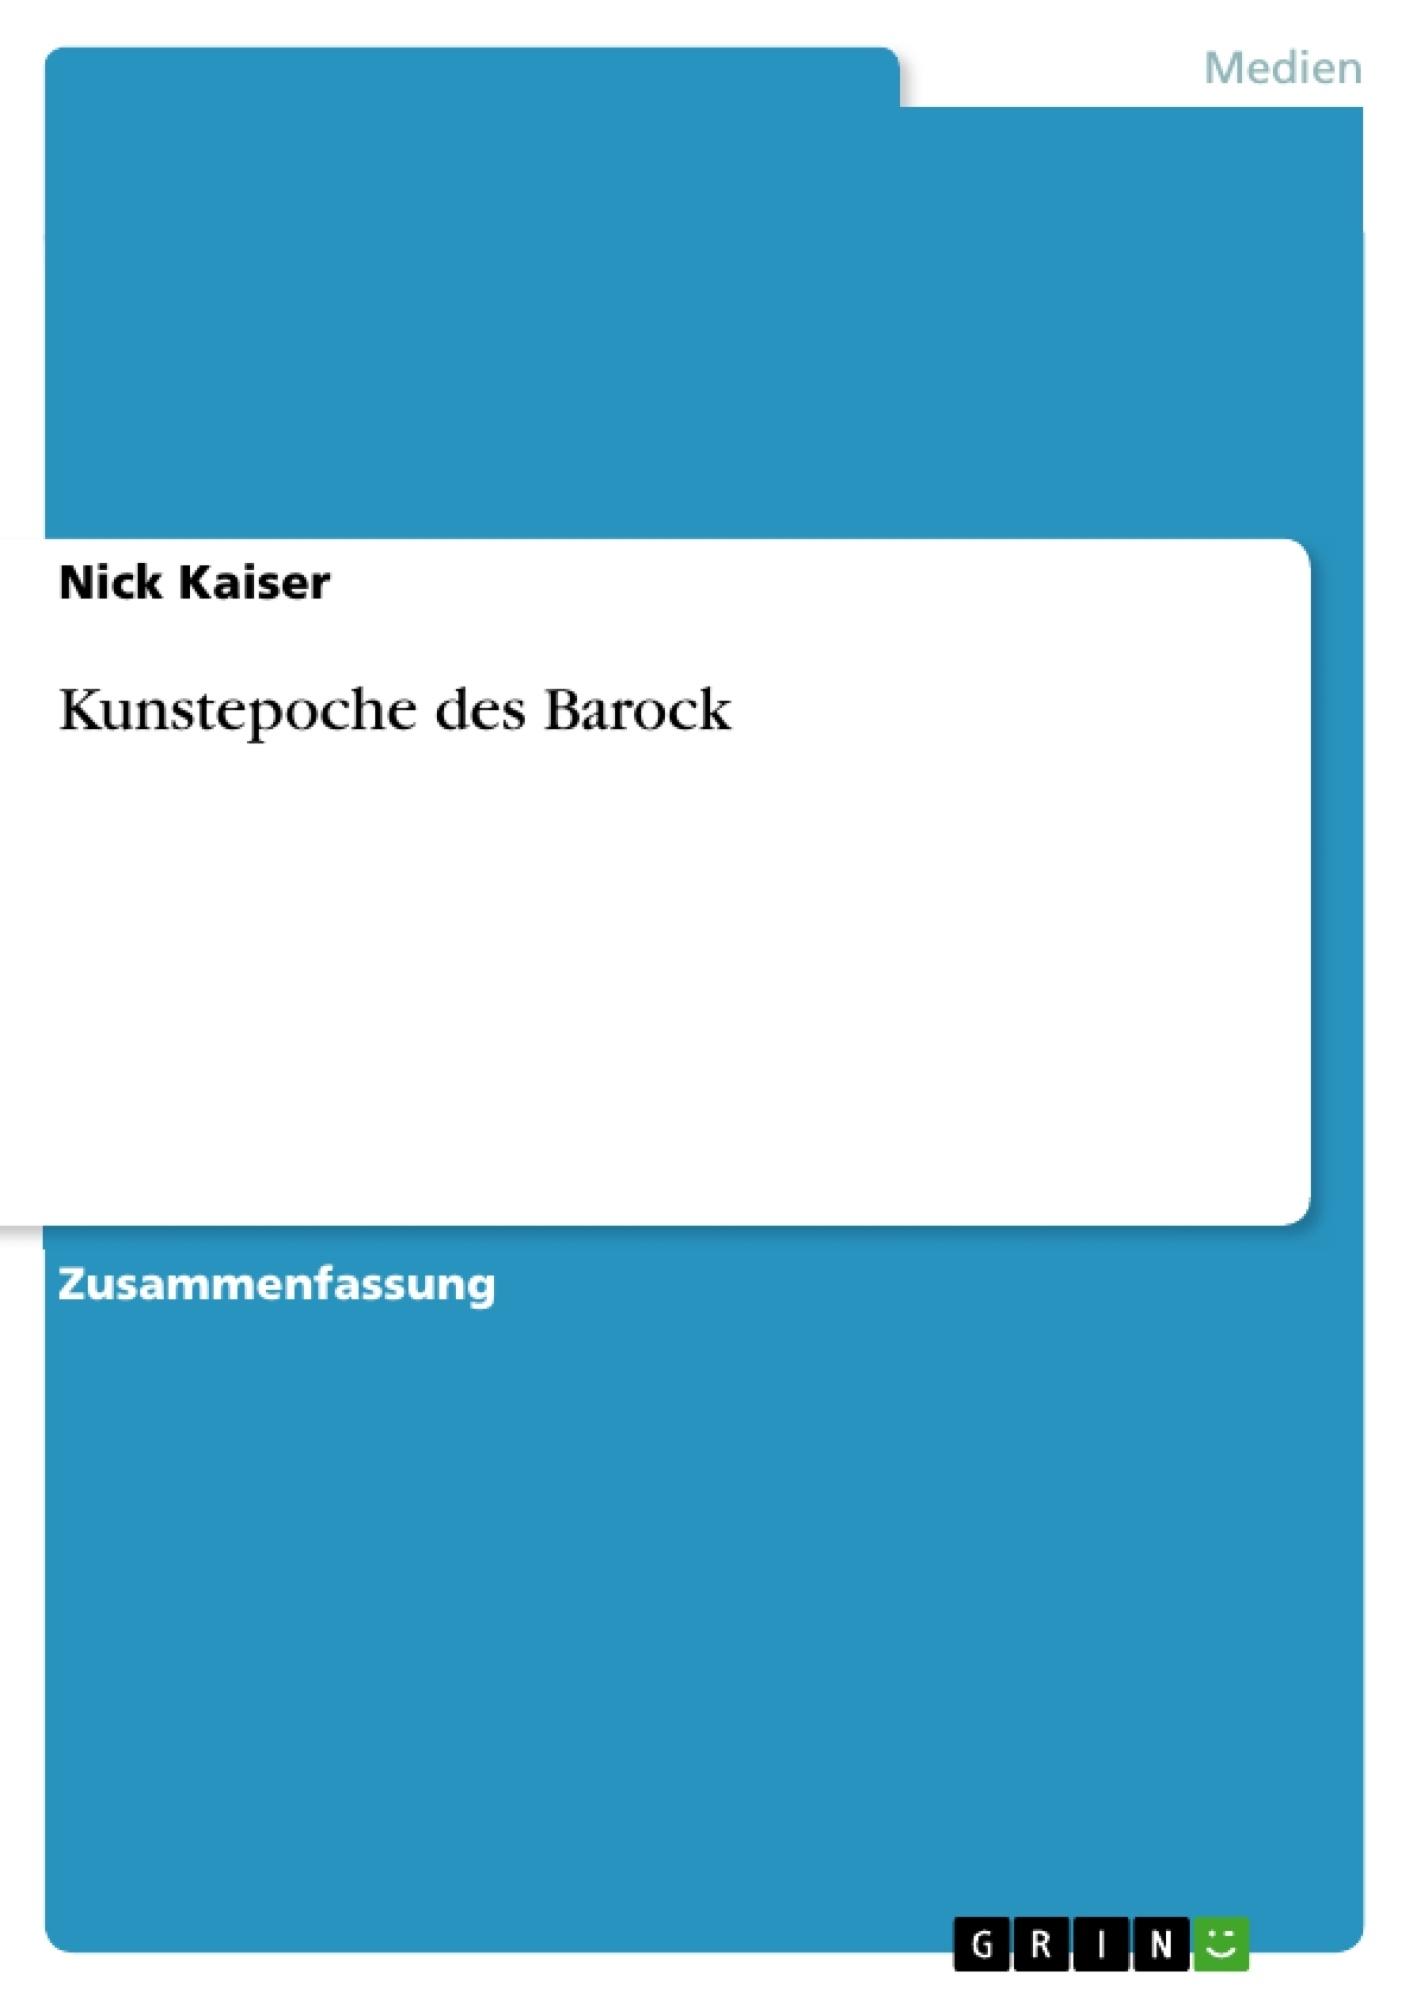 Titel: Kunstepoche des Barock